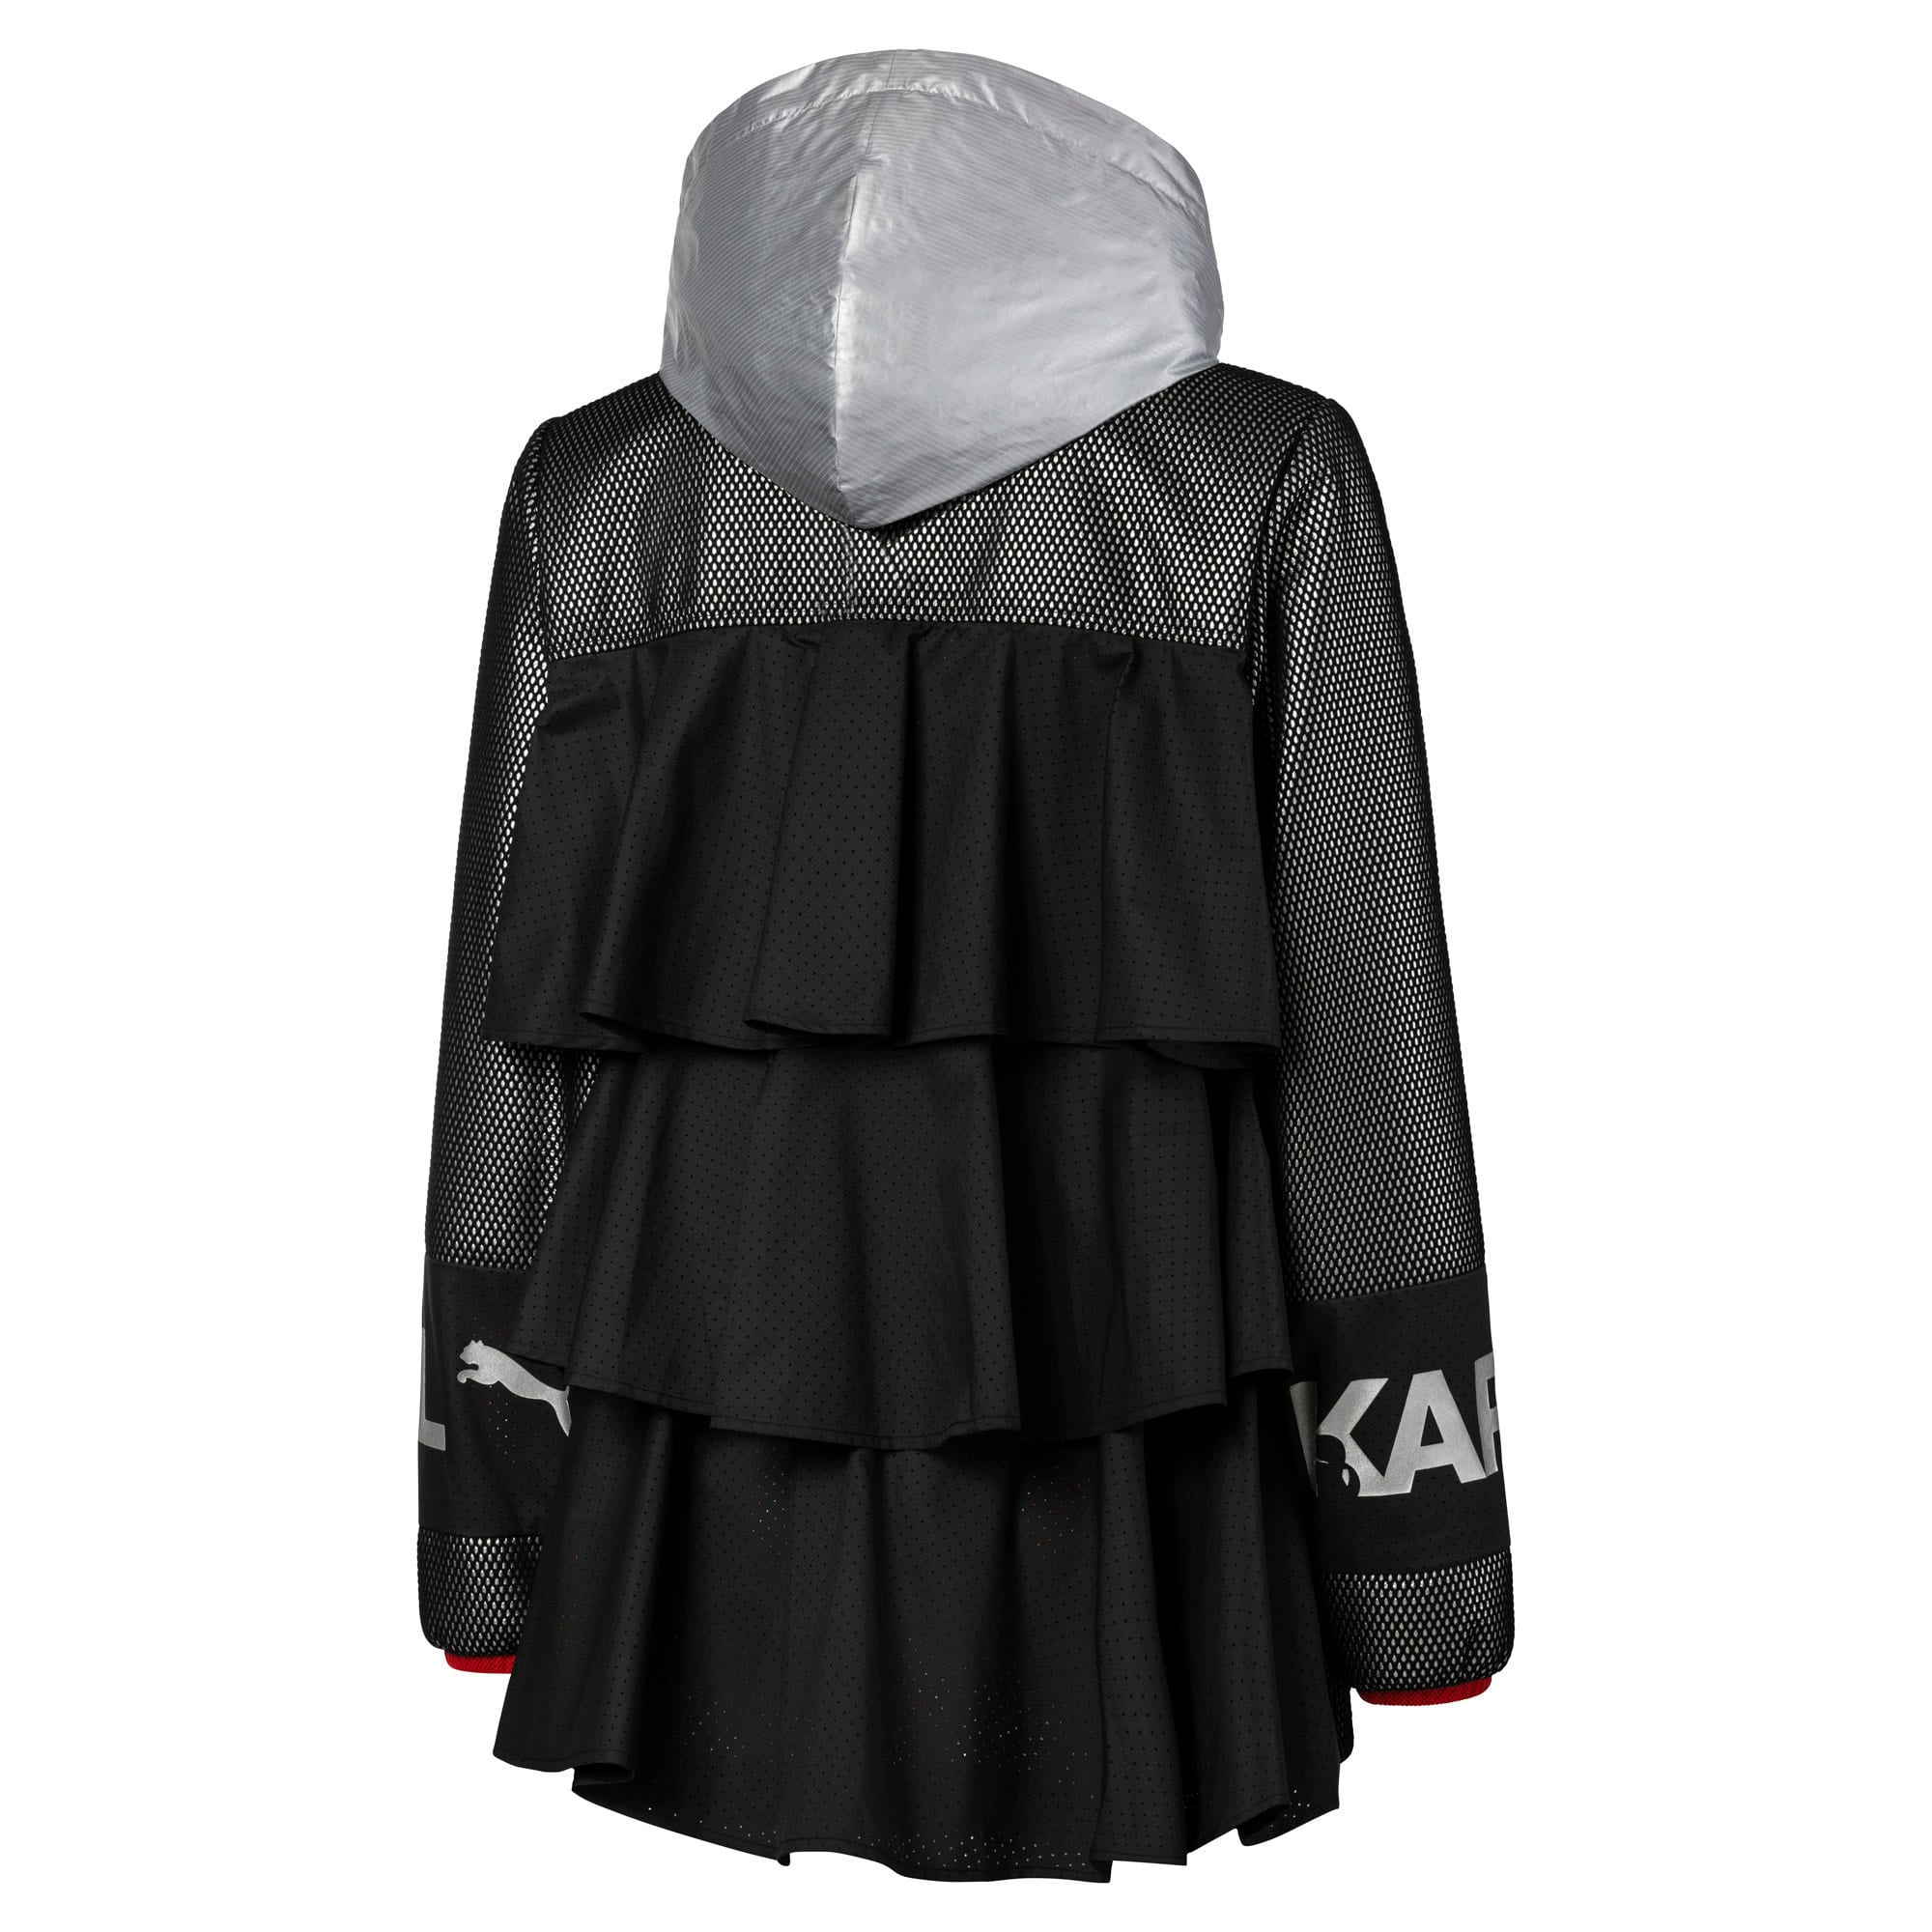 Thumbnail 5 of PUMA x KARL LAGERFELD Women's Outerwear Jacket, Puma Black, medium